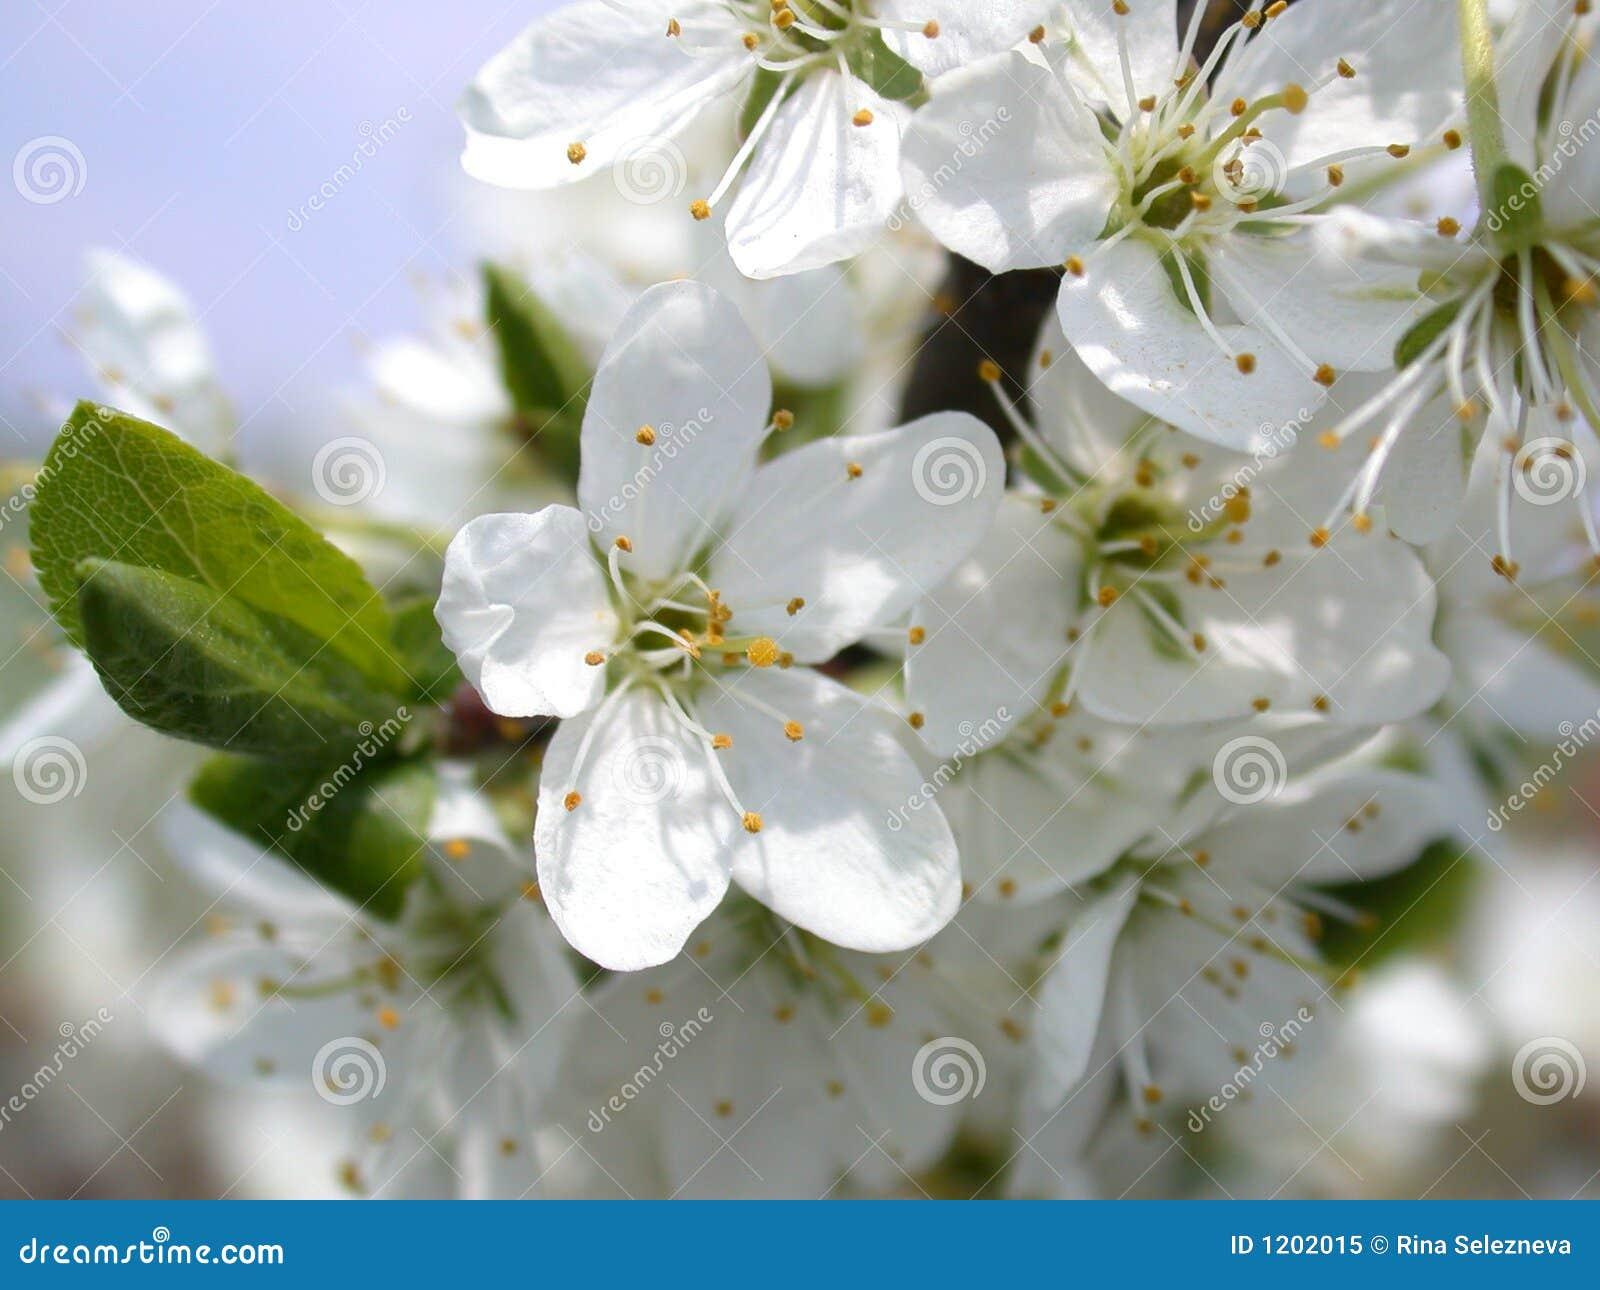 Flower of the aple trees